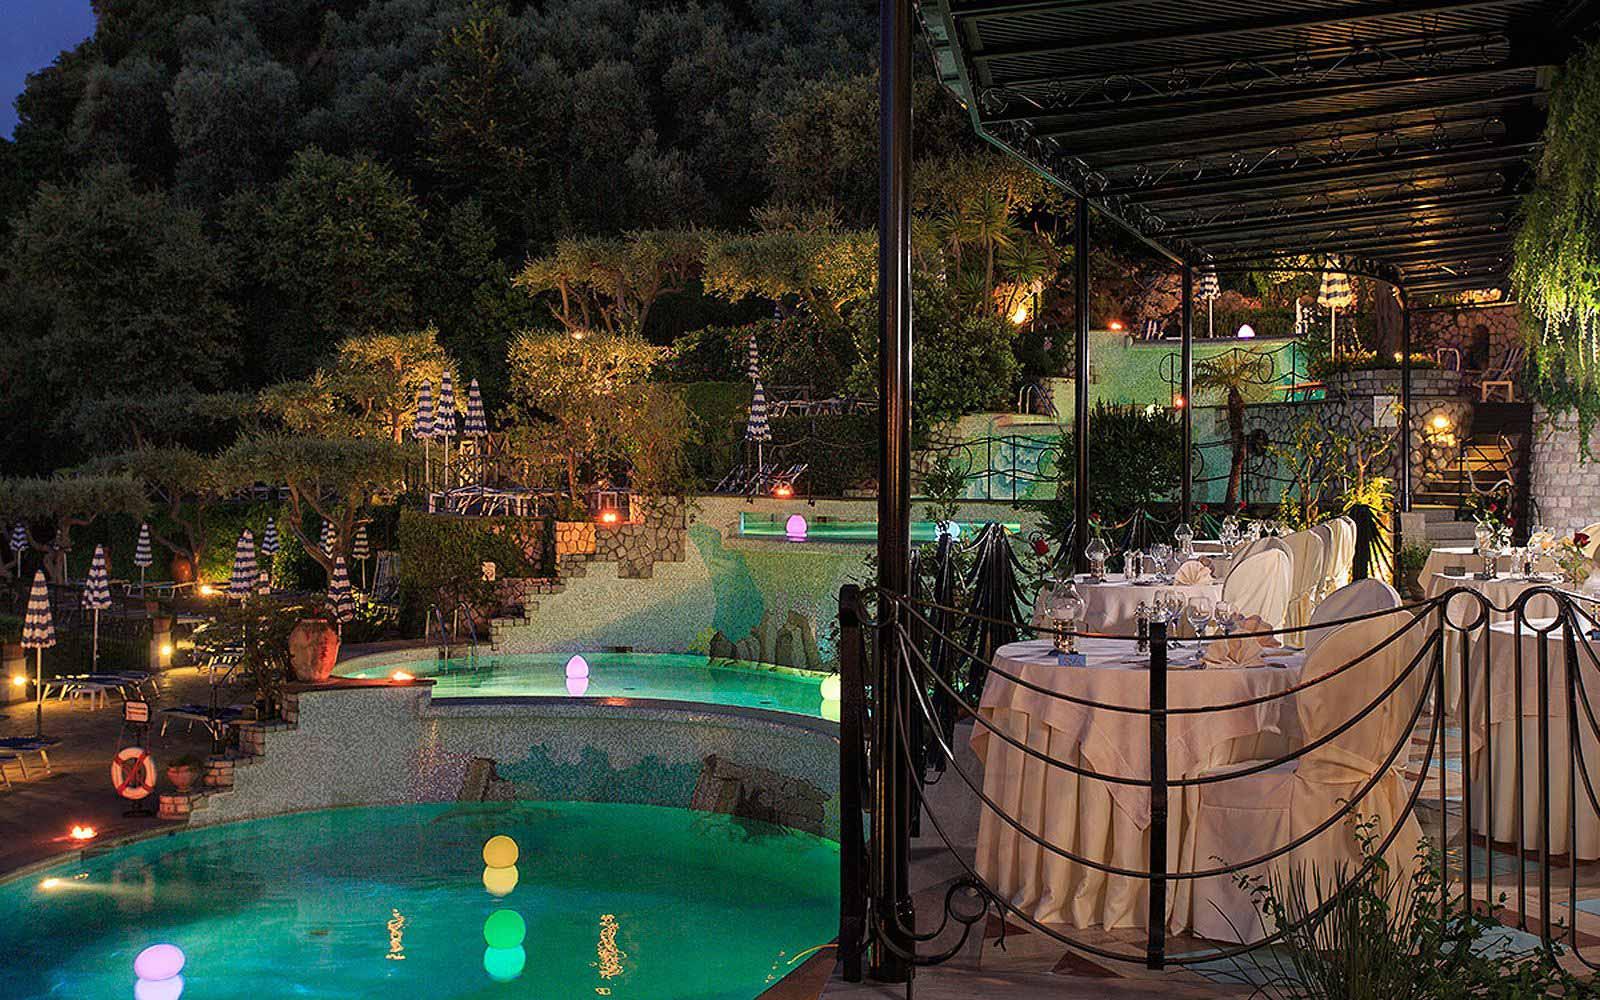 Bellevue Restaurant at the Grand Hotel Capodimonte